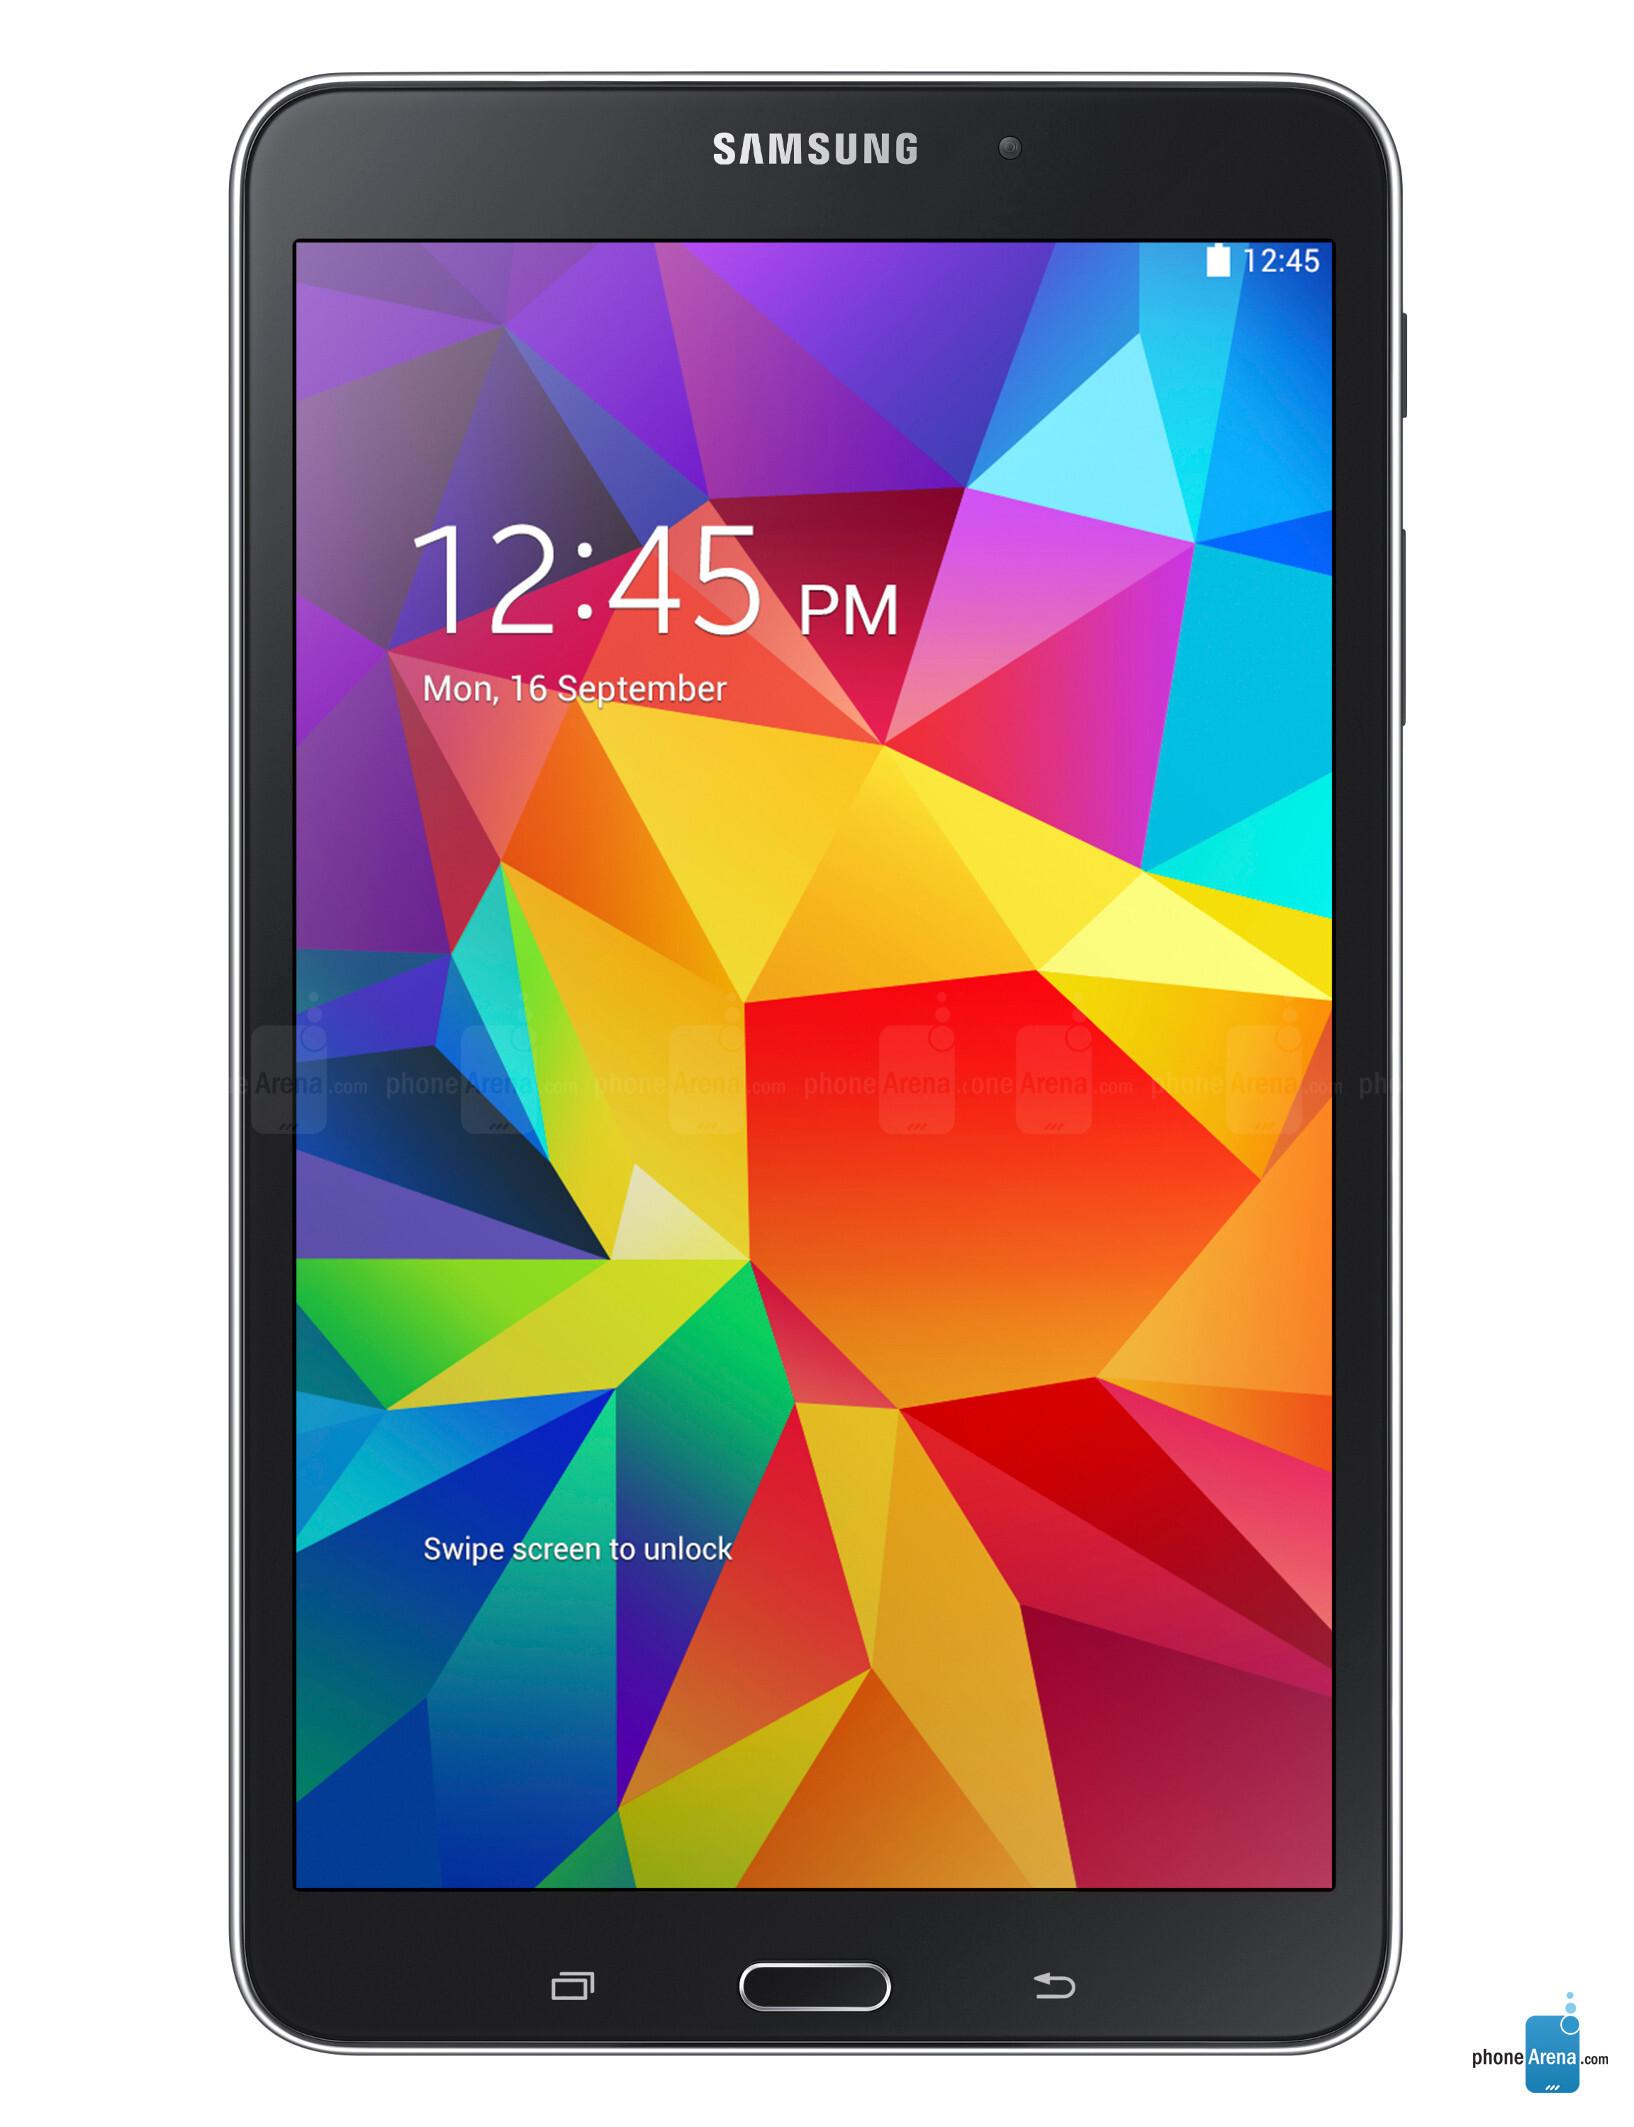 Samsung Galaxy Tab 4 8.0 specs